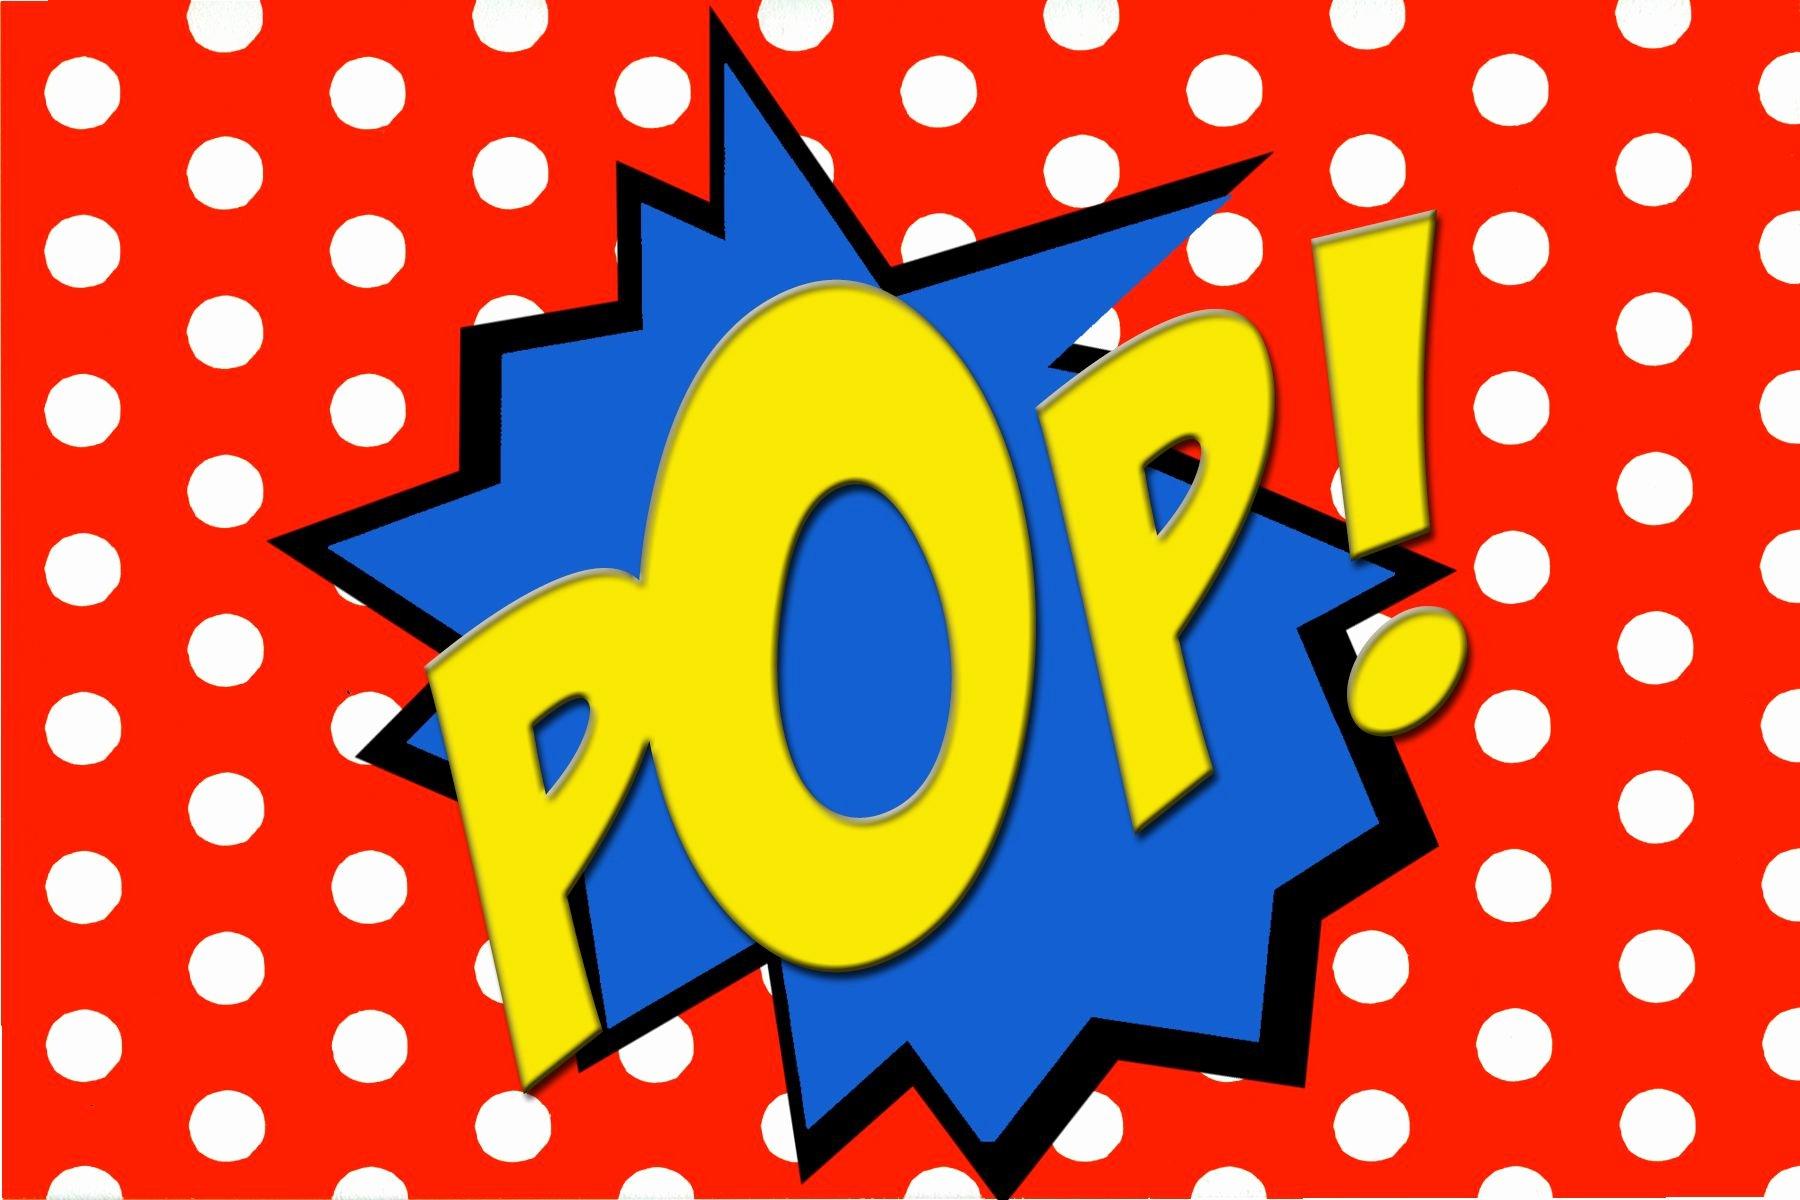 Comic Strip Template Word Unique Free Printable Pop Ic Book Word Superhero Party